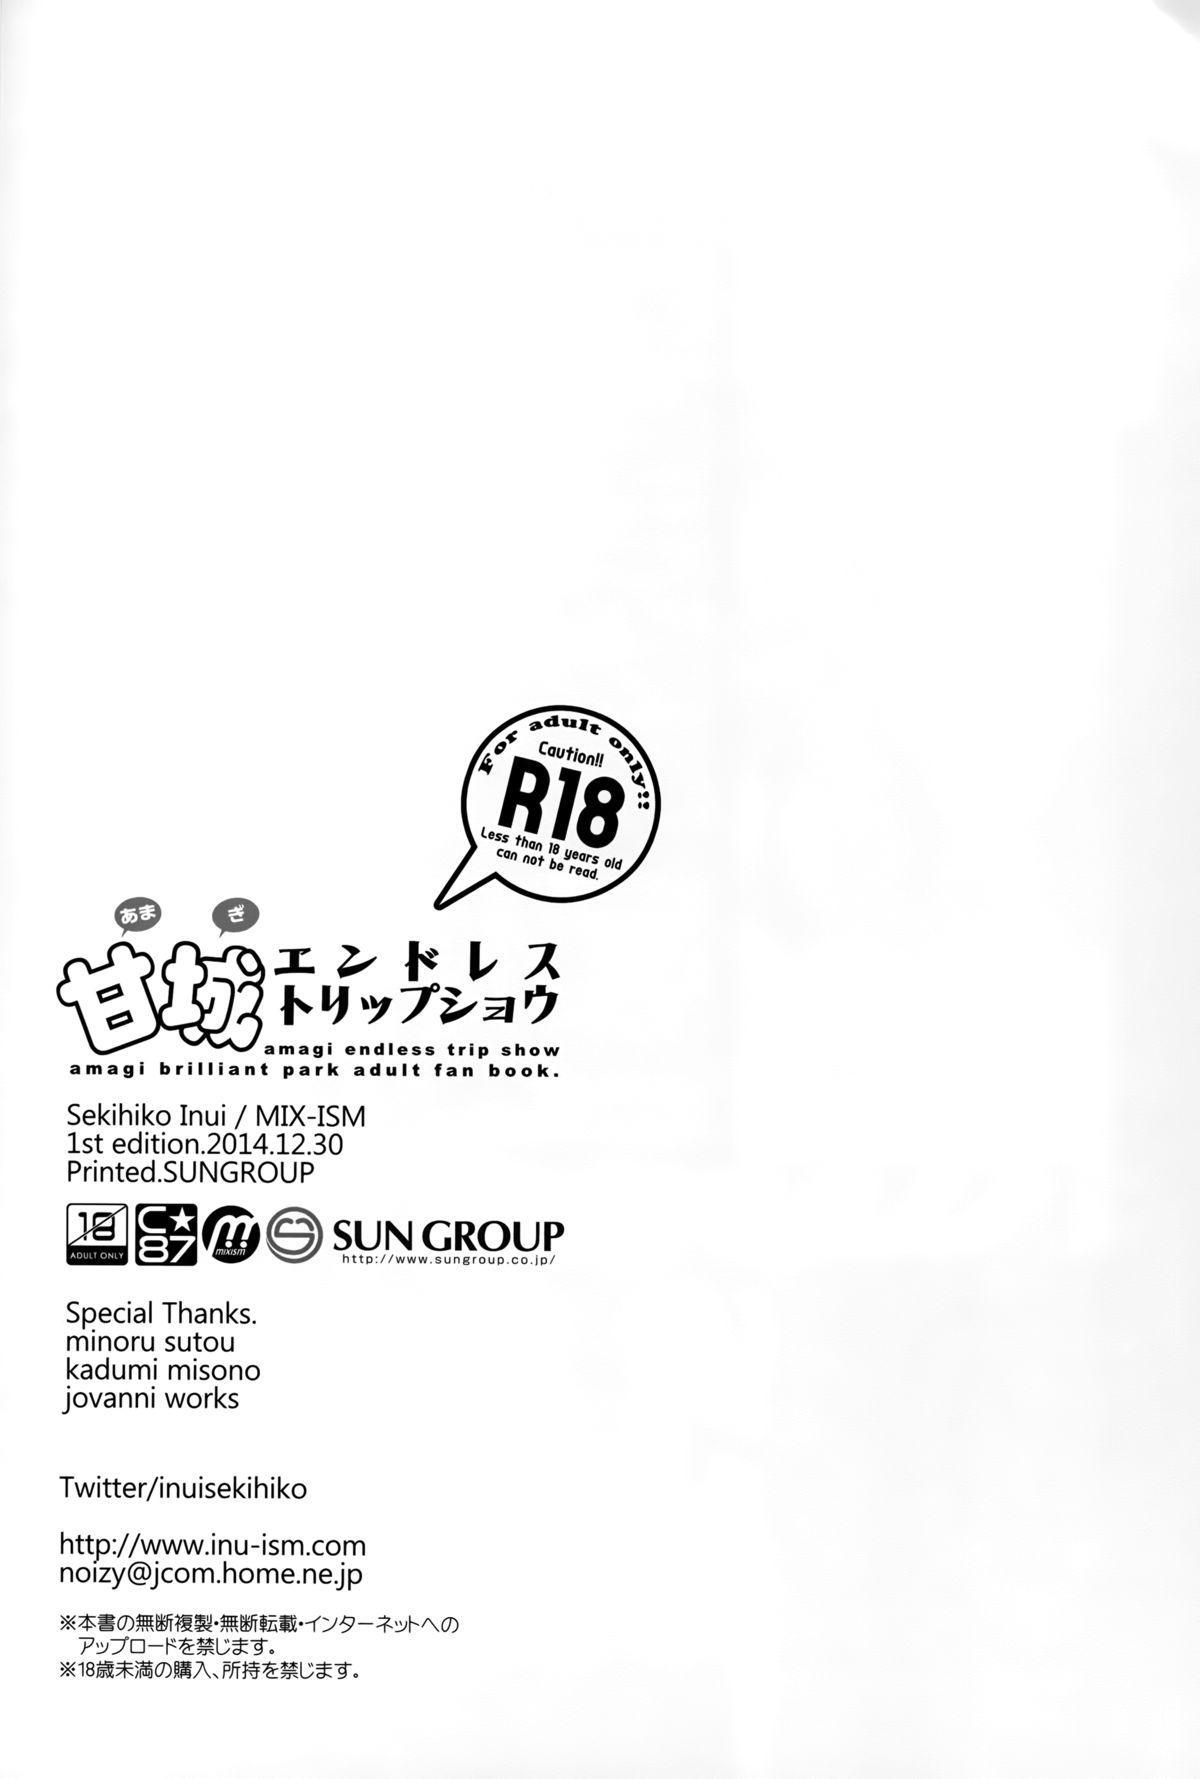 Amagi Endless Trip Show 28